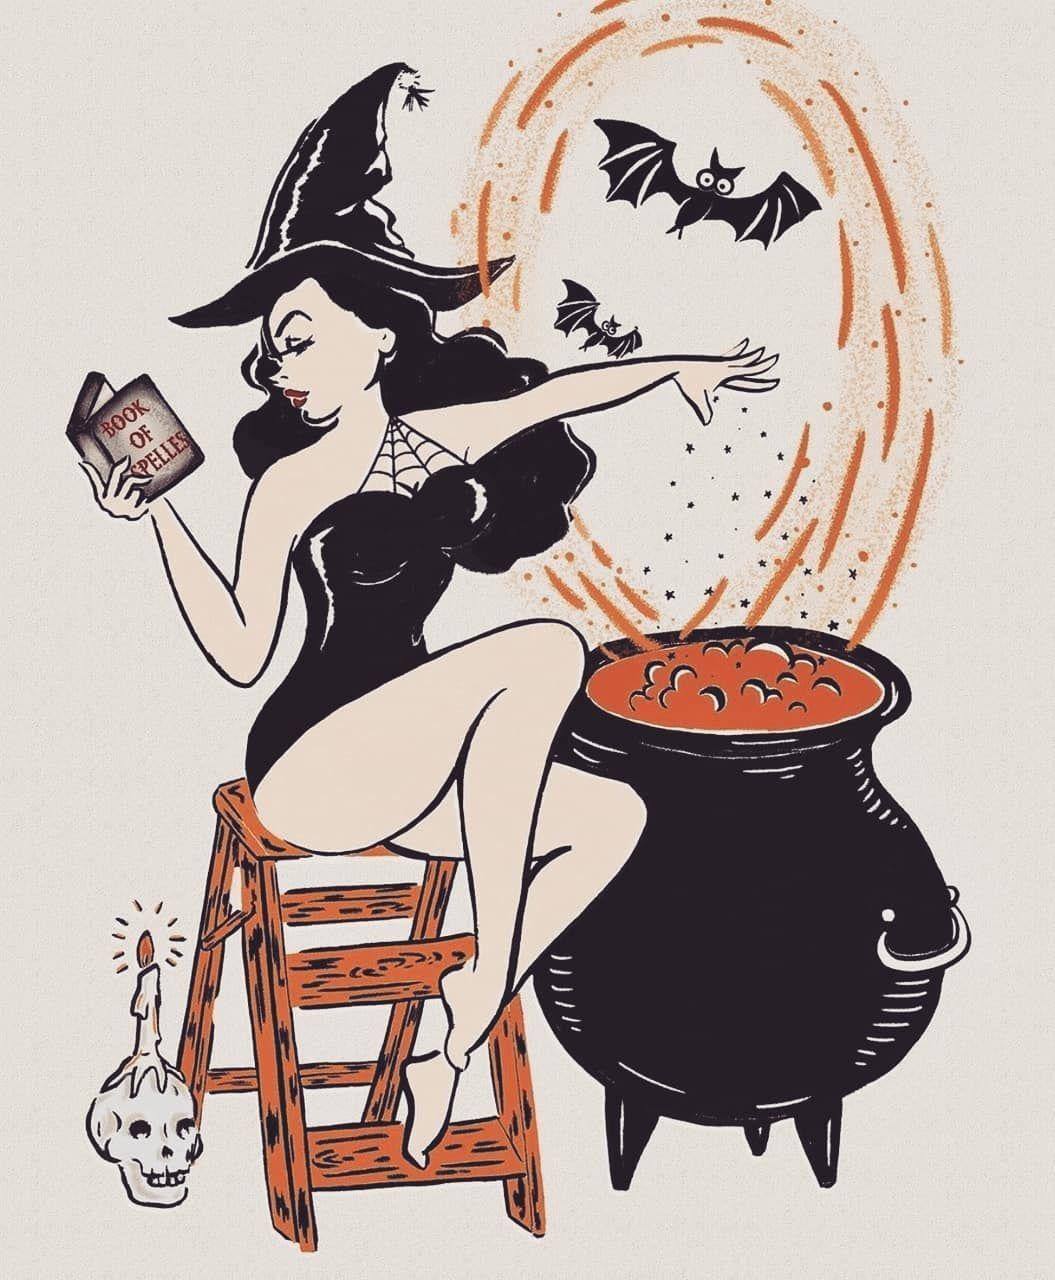 "🦇 𝕳𝖆𝖑𝖑𝖔𝖜𝖊𝖊𝖓 𝕸𝖆𝖒𝖆 🦇 on Instagram: ""Me! 🦇🖤🦇 . . From @mischief_made_me . #halloweenqueen #happyhalloween #halloweenseason #halloween #everydayishalloween #witchesofinstagram…"""